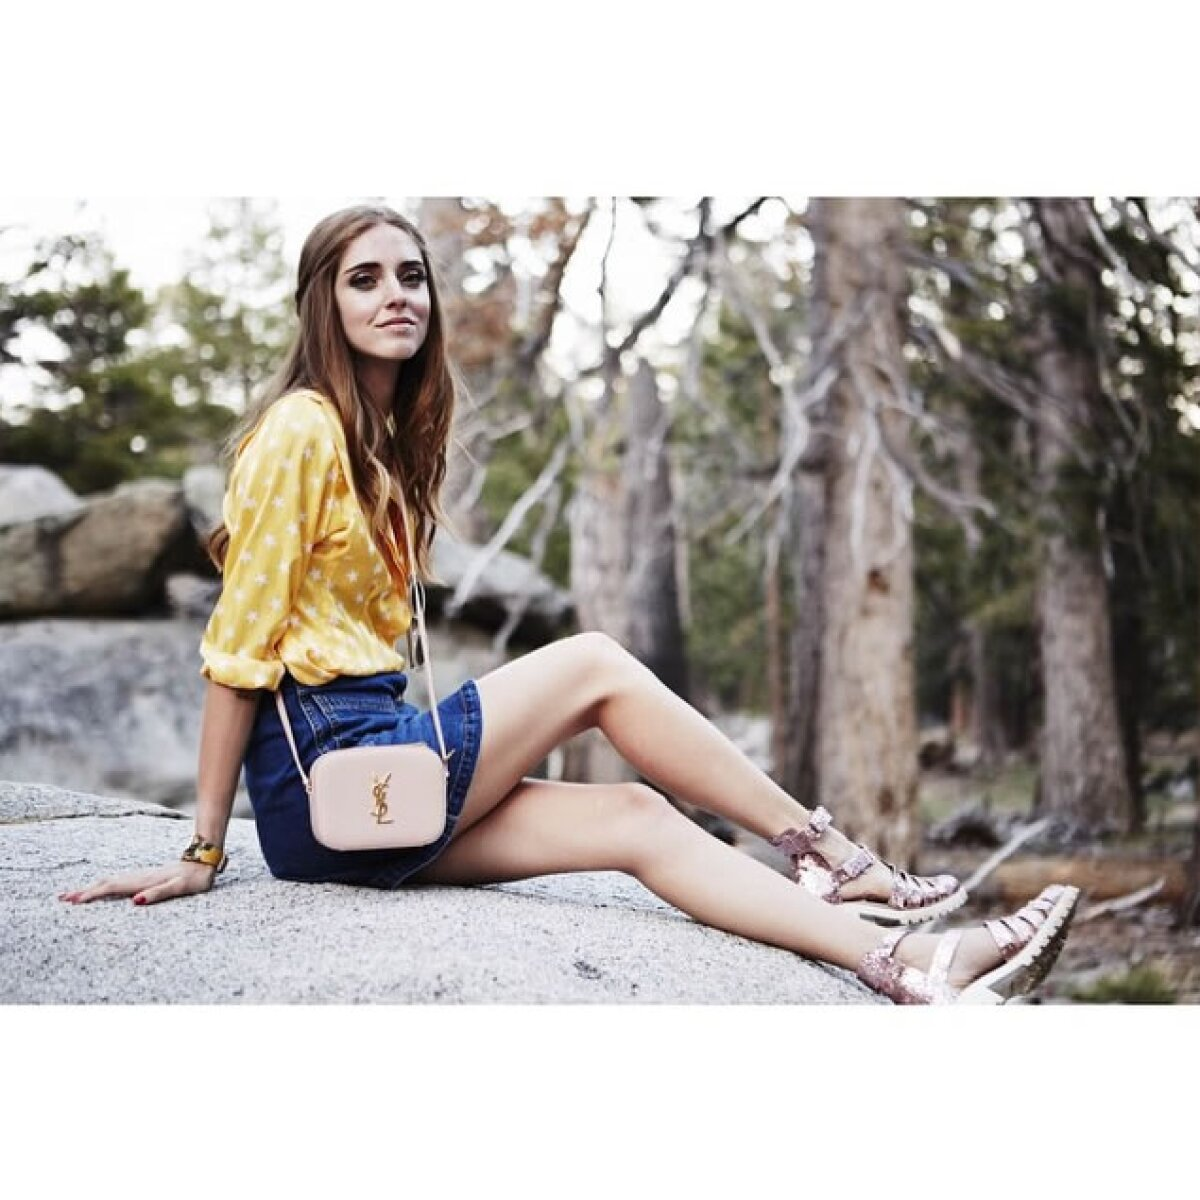 Summer looks: Así visten las bloggers en verano